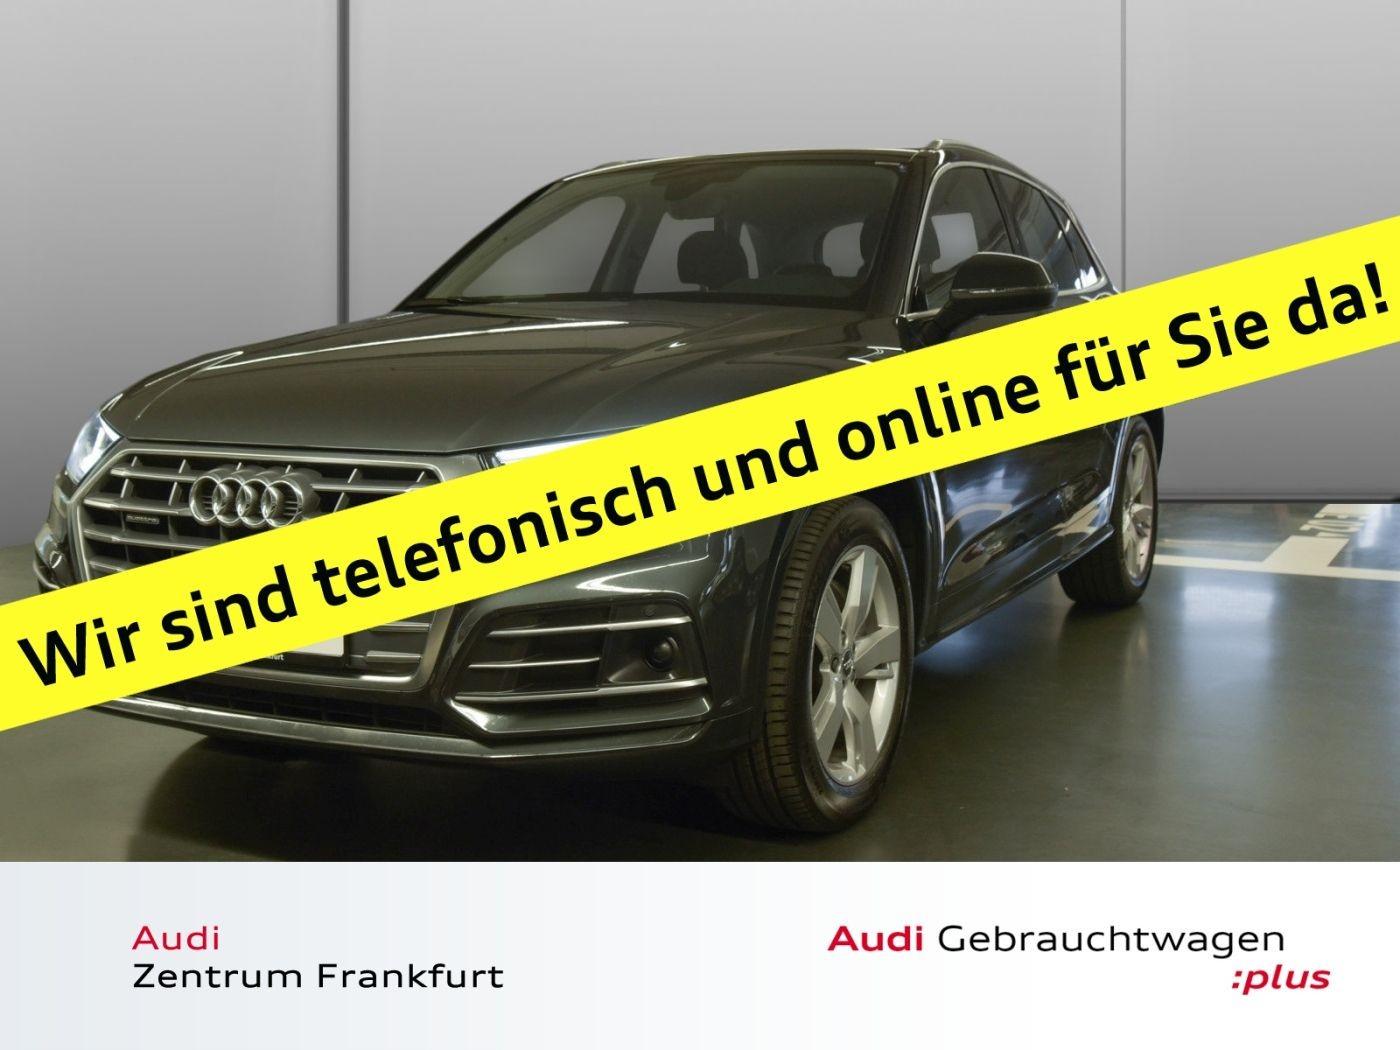 Audi Q5 2.0 TDI quattro S tronic S line LED Navi PDC Sitzheizung, Jahr 2018, Diesel